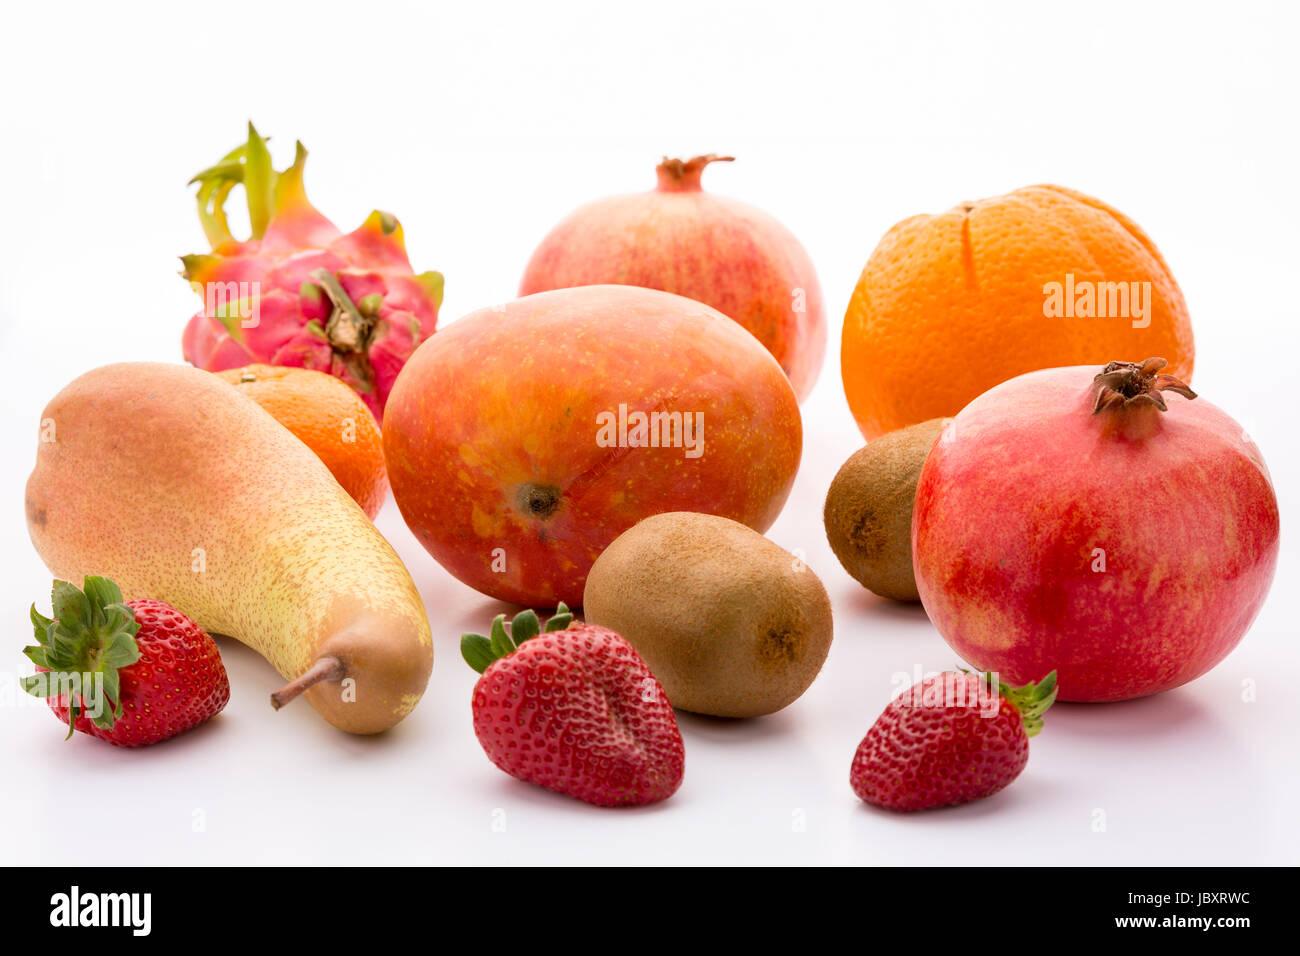 Exotic and domestic fruits: mango, two pomegranates, one pitaya, two kiwifruits, a pear, three garden strawberries - Stock Image